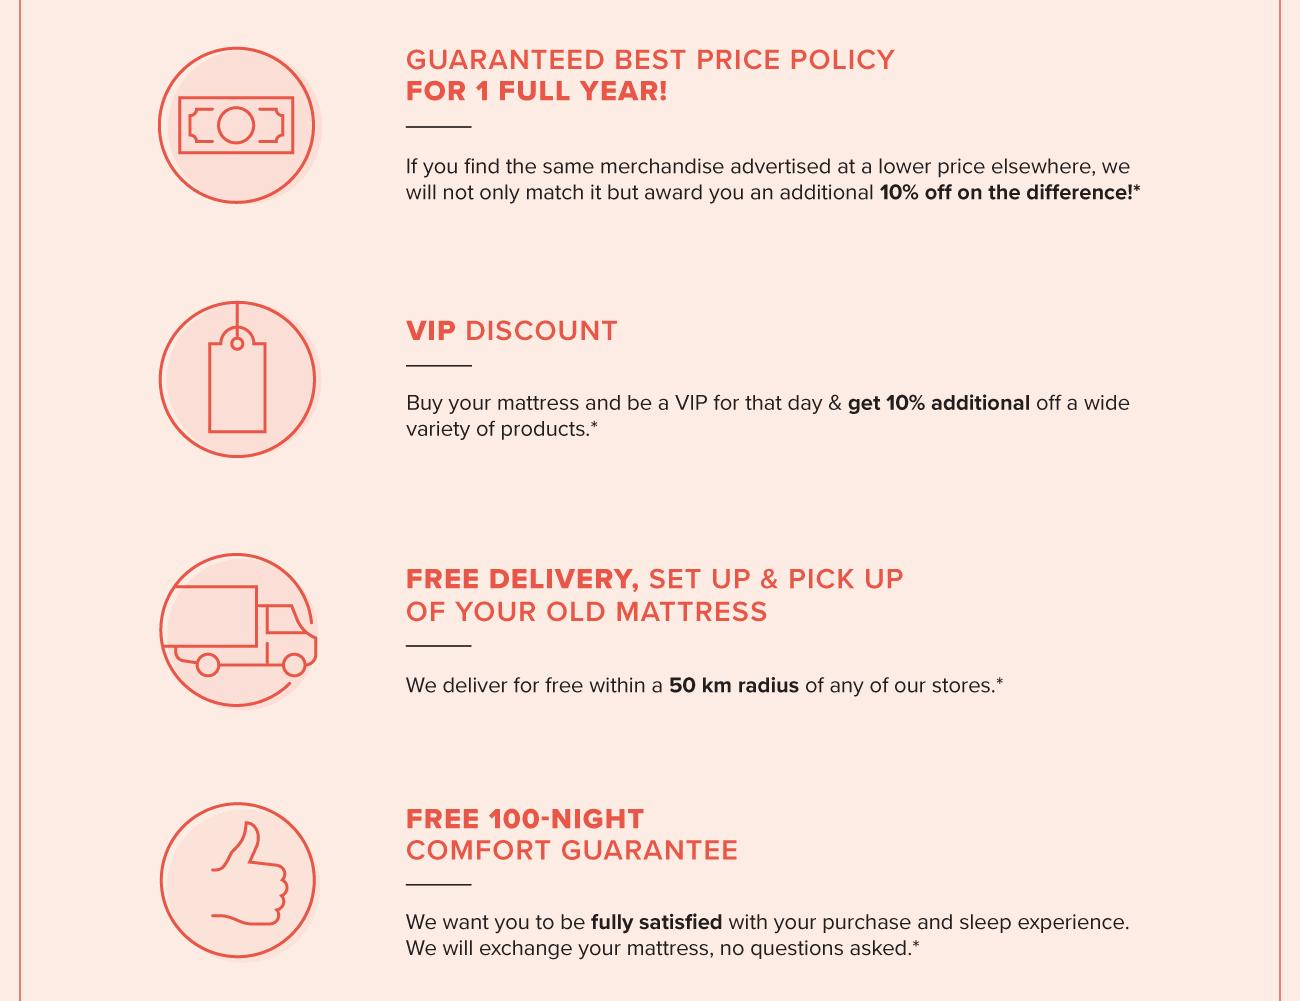 Why Buy a Mattress at Linen Chest?